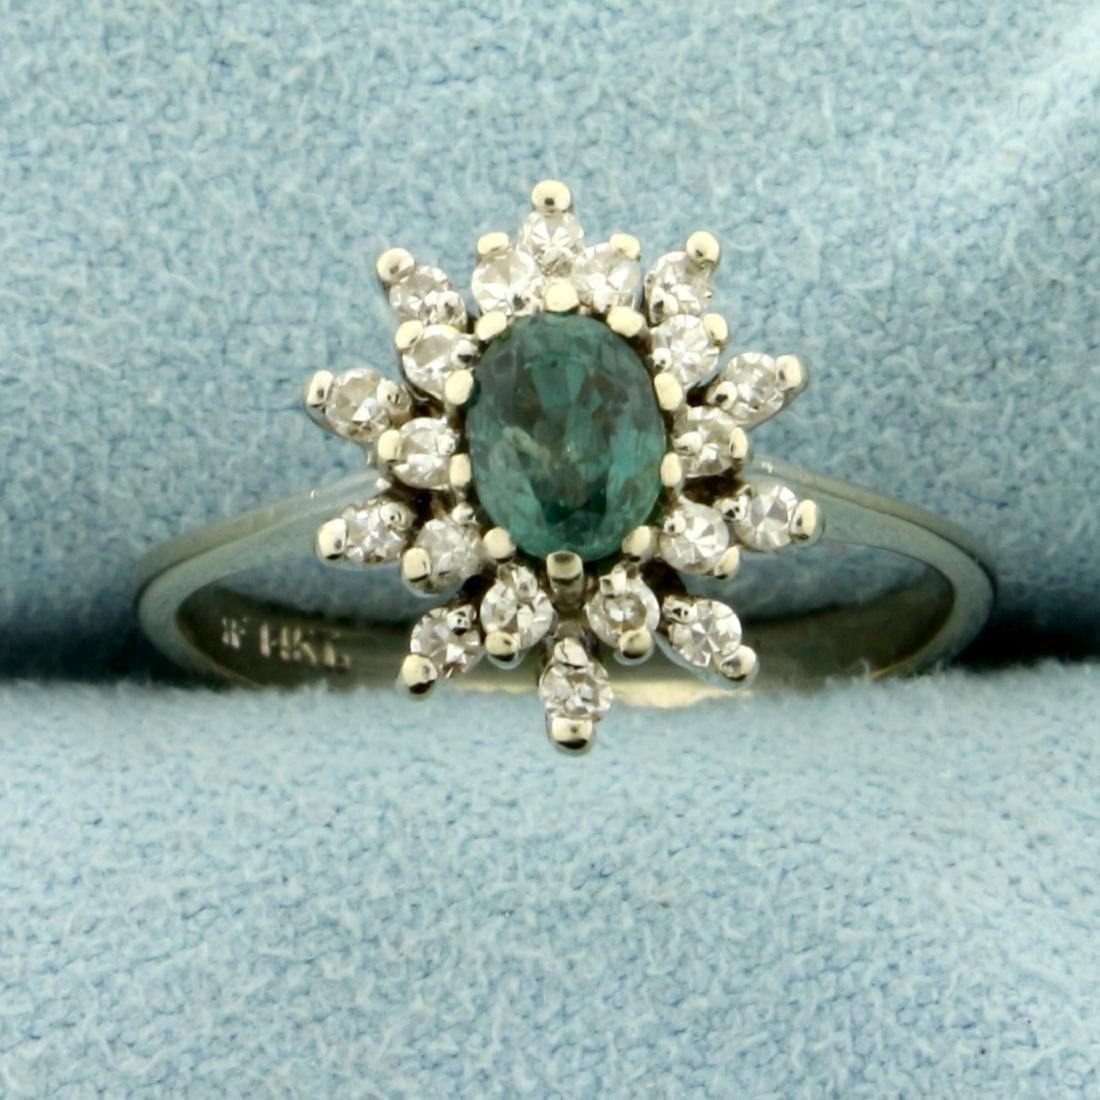 Natural Alexandrite and Diamond Starburst Ring in 14K